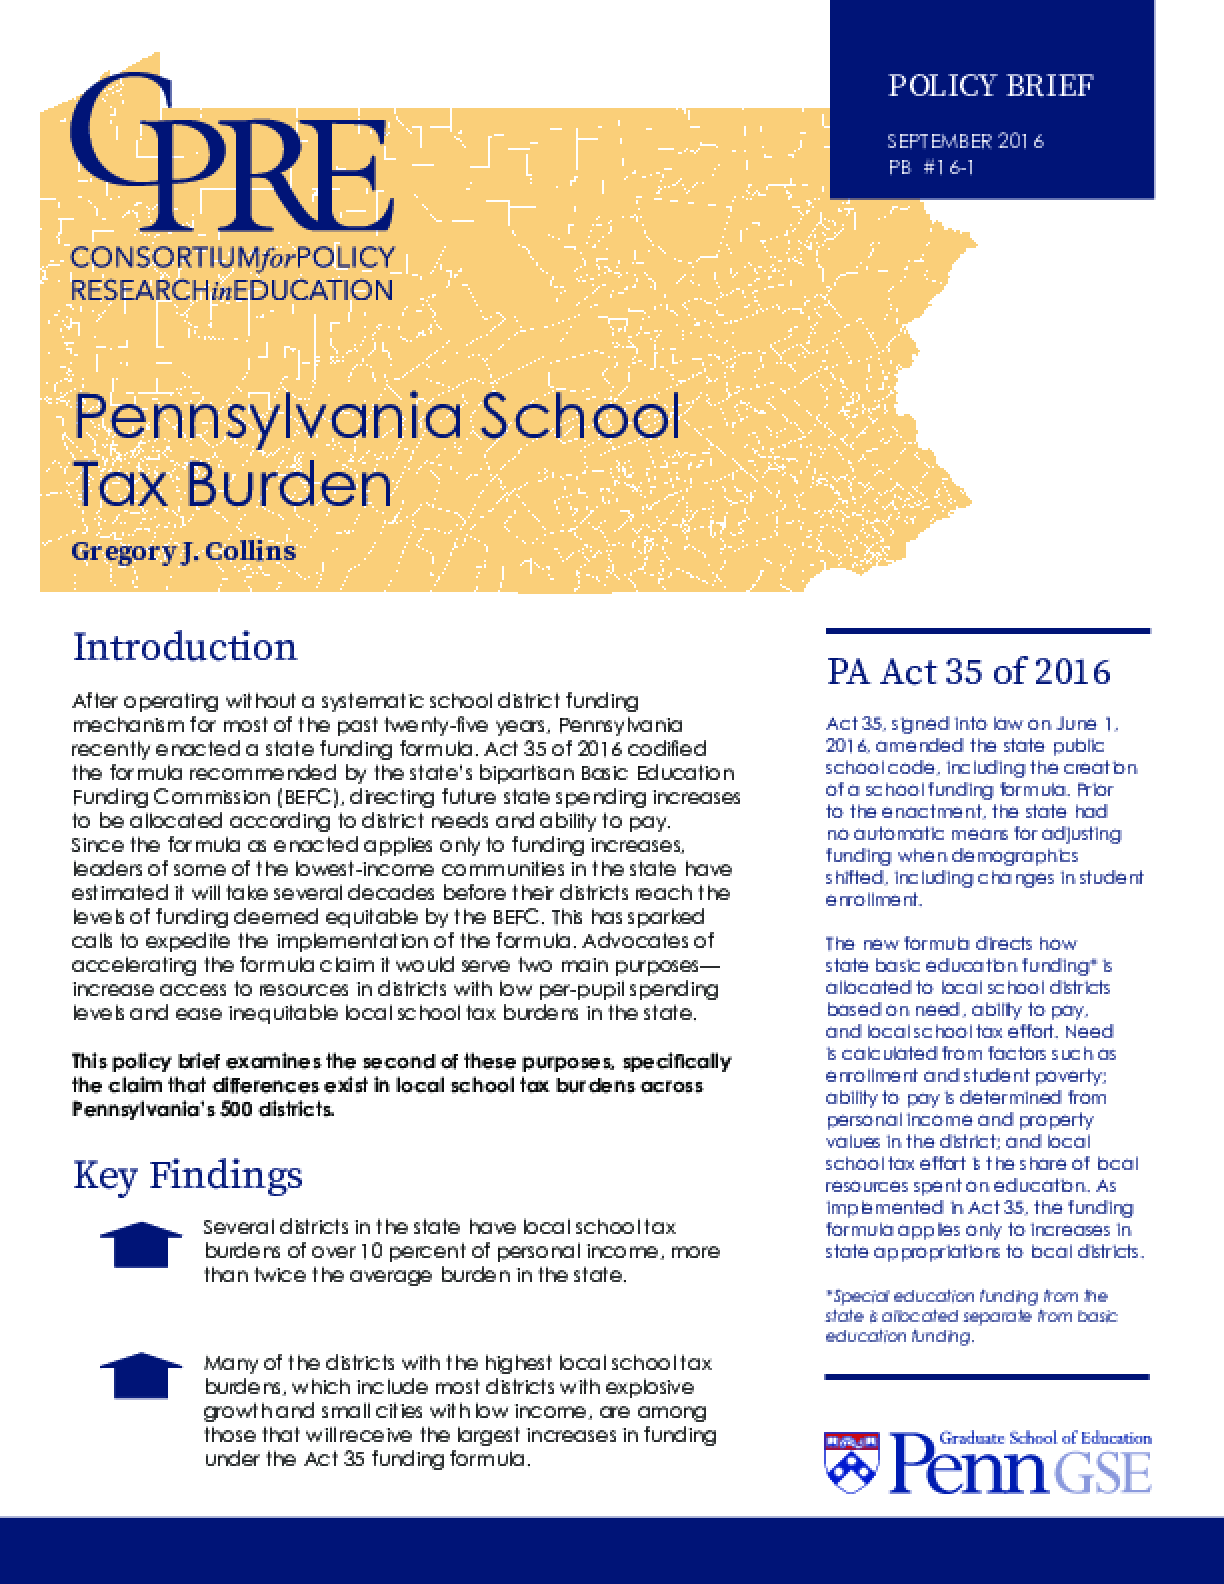 Pennsylvania School Tax Burden